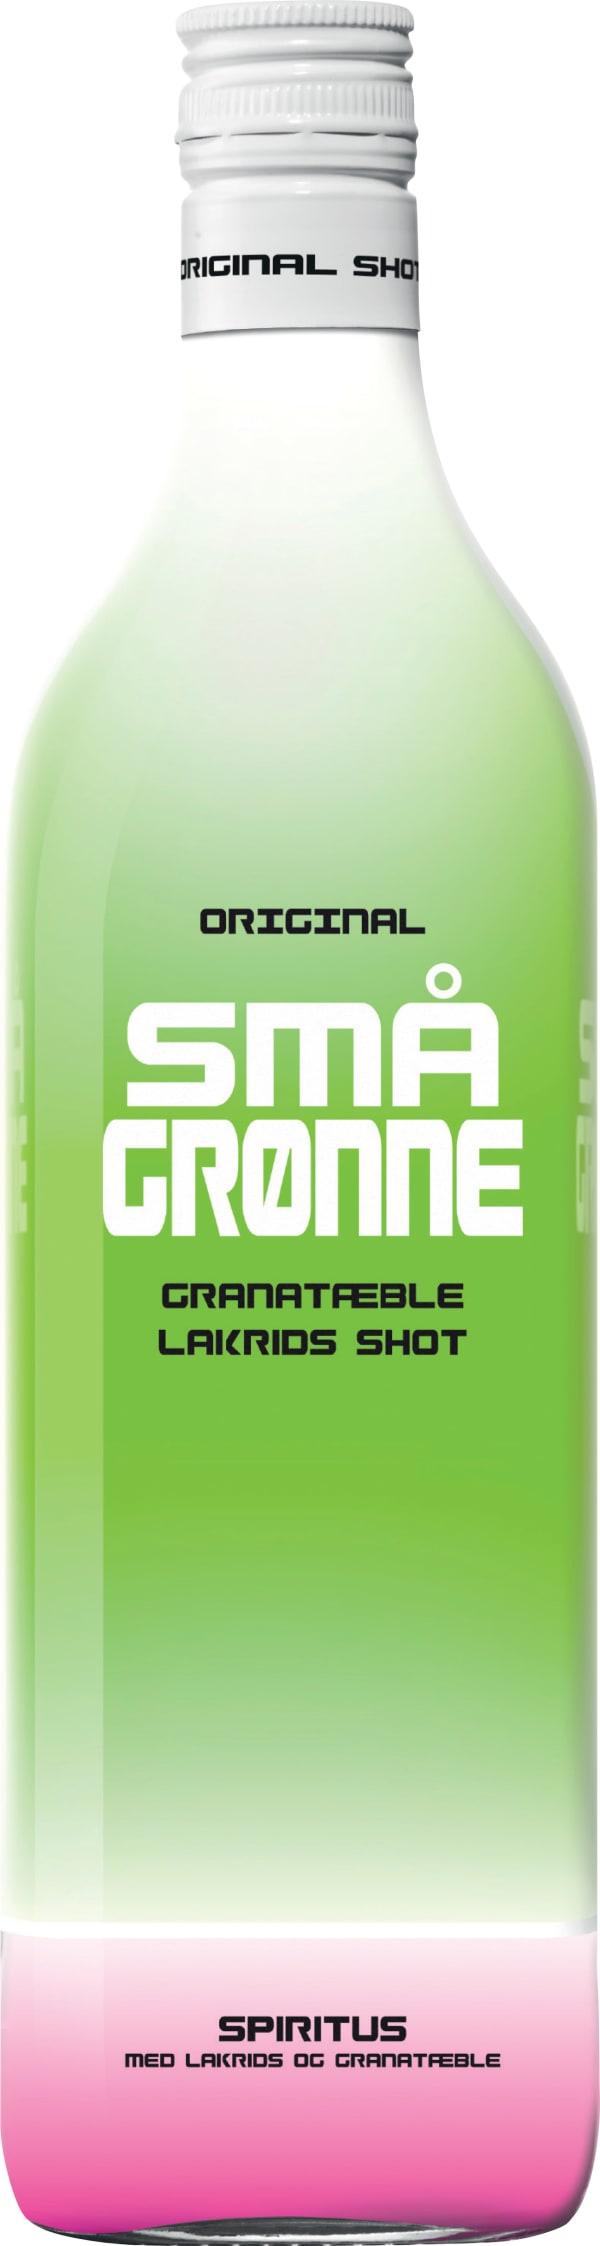 Små Gronne Granatable Lakrids Shot plastflaska